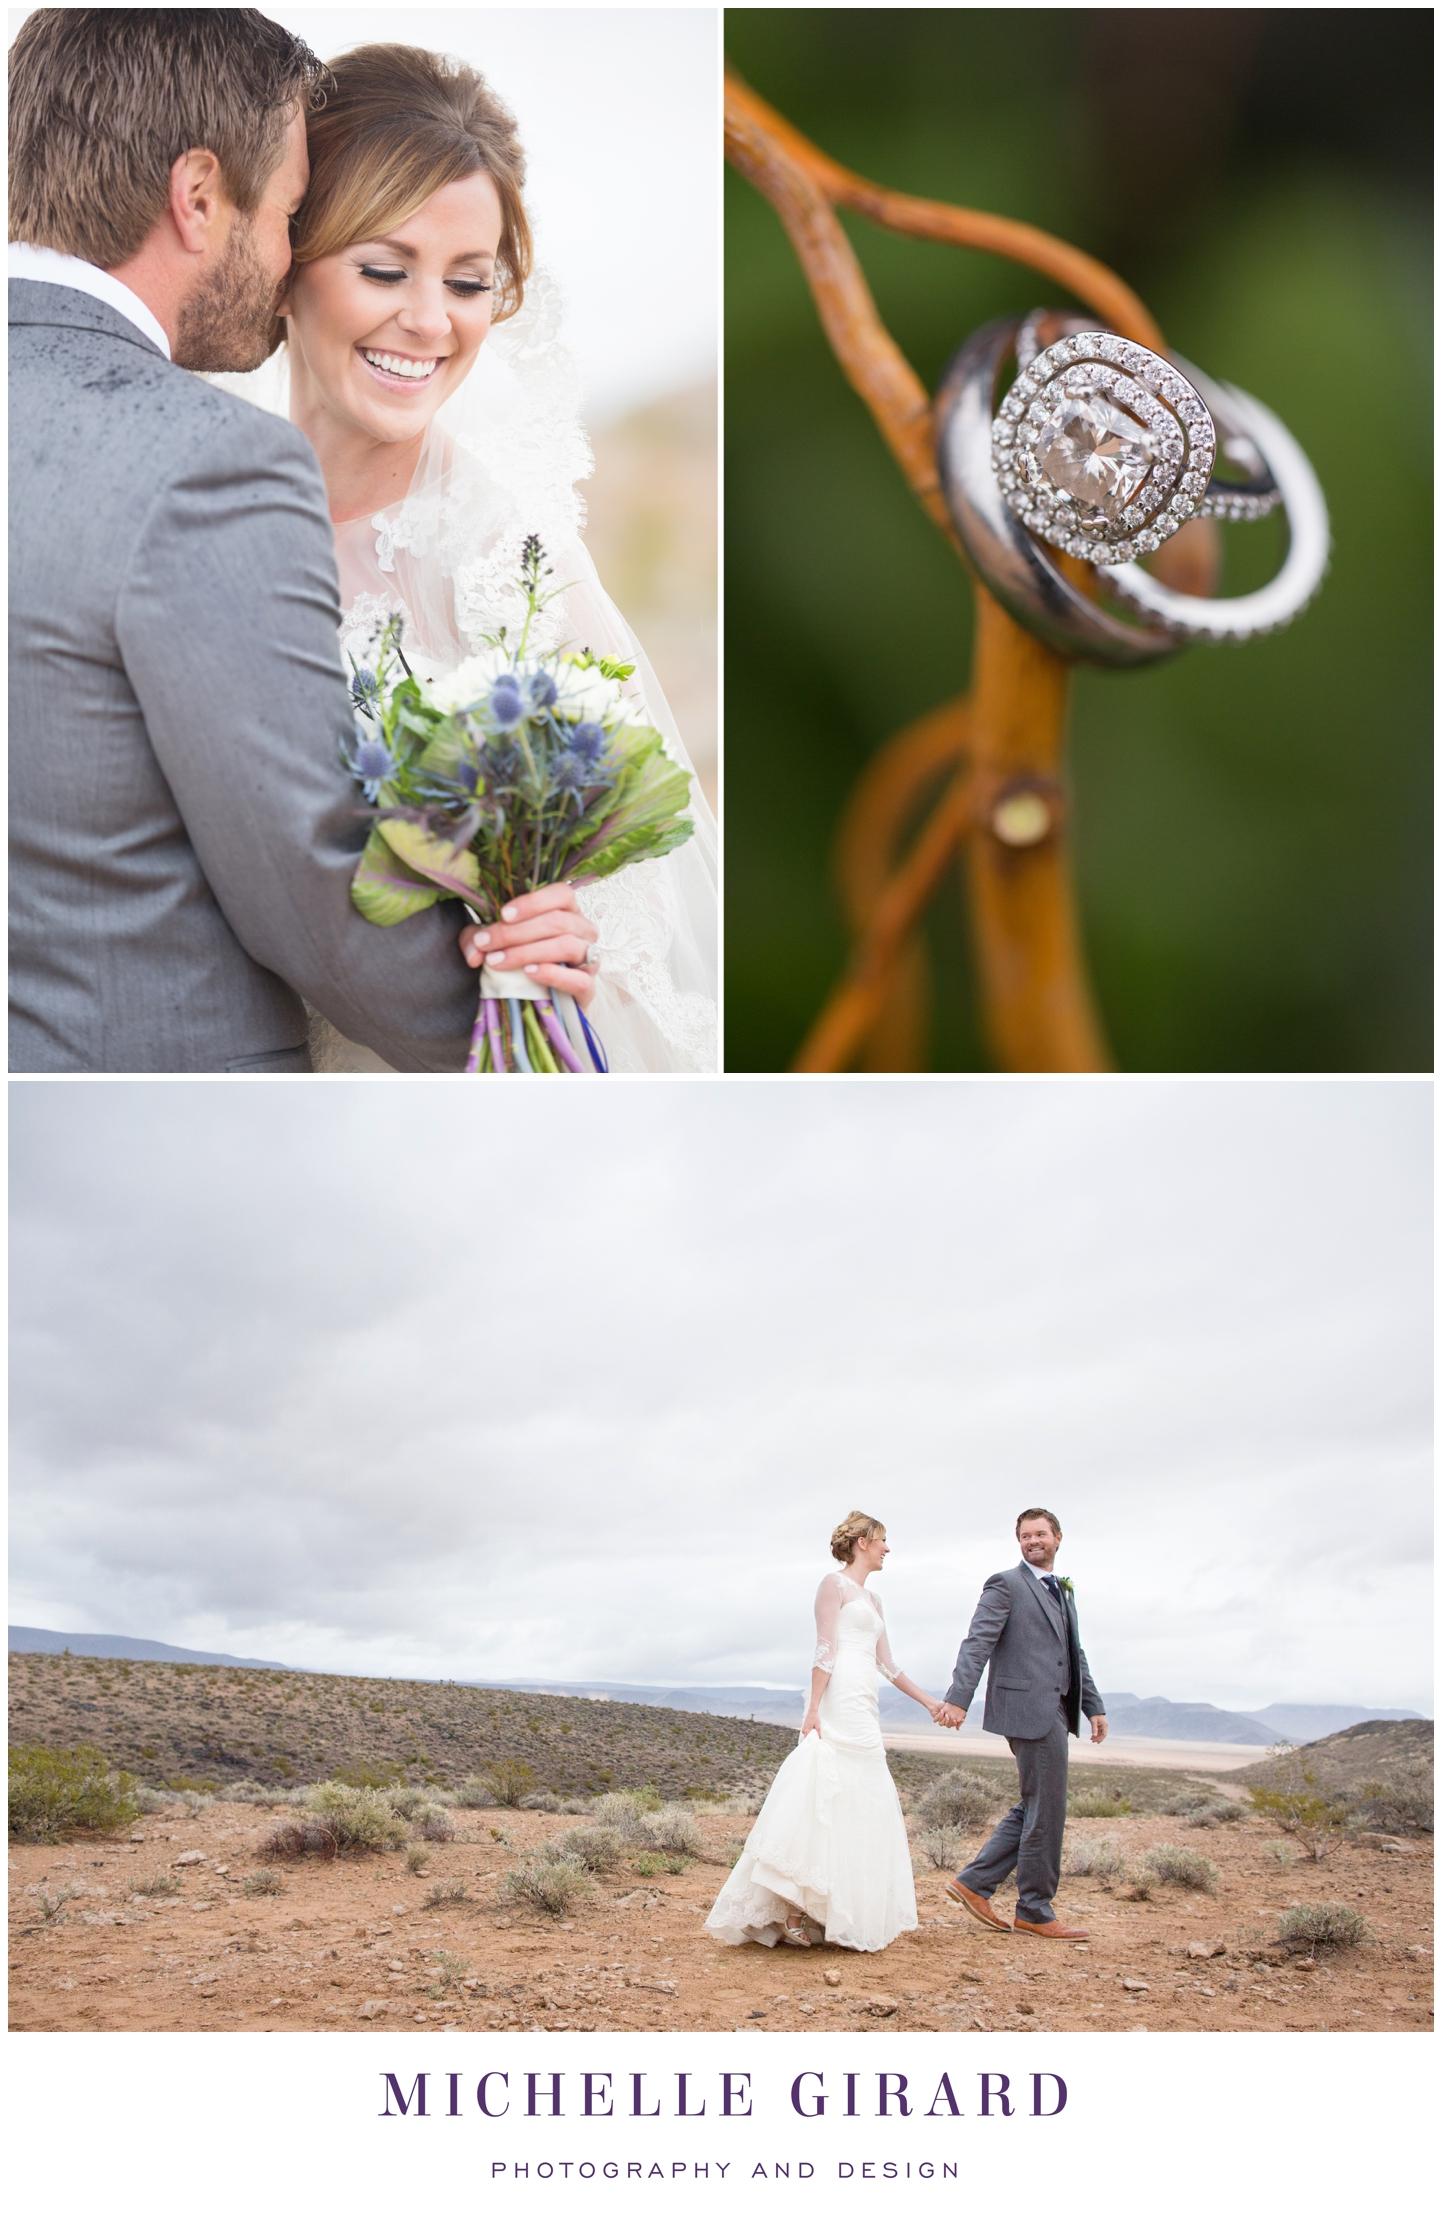 nevada-desert-lace-veil-michelle-girard-wedding-photography09.jpg